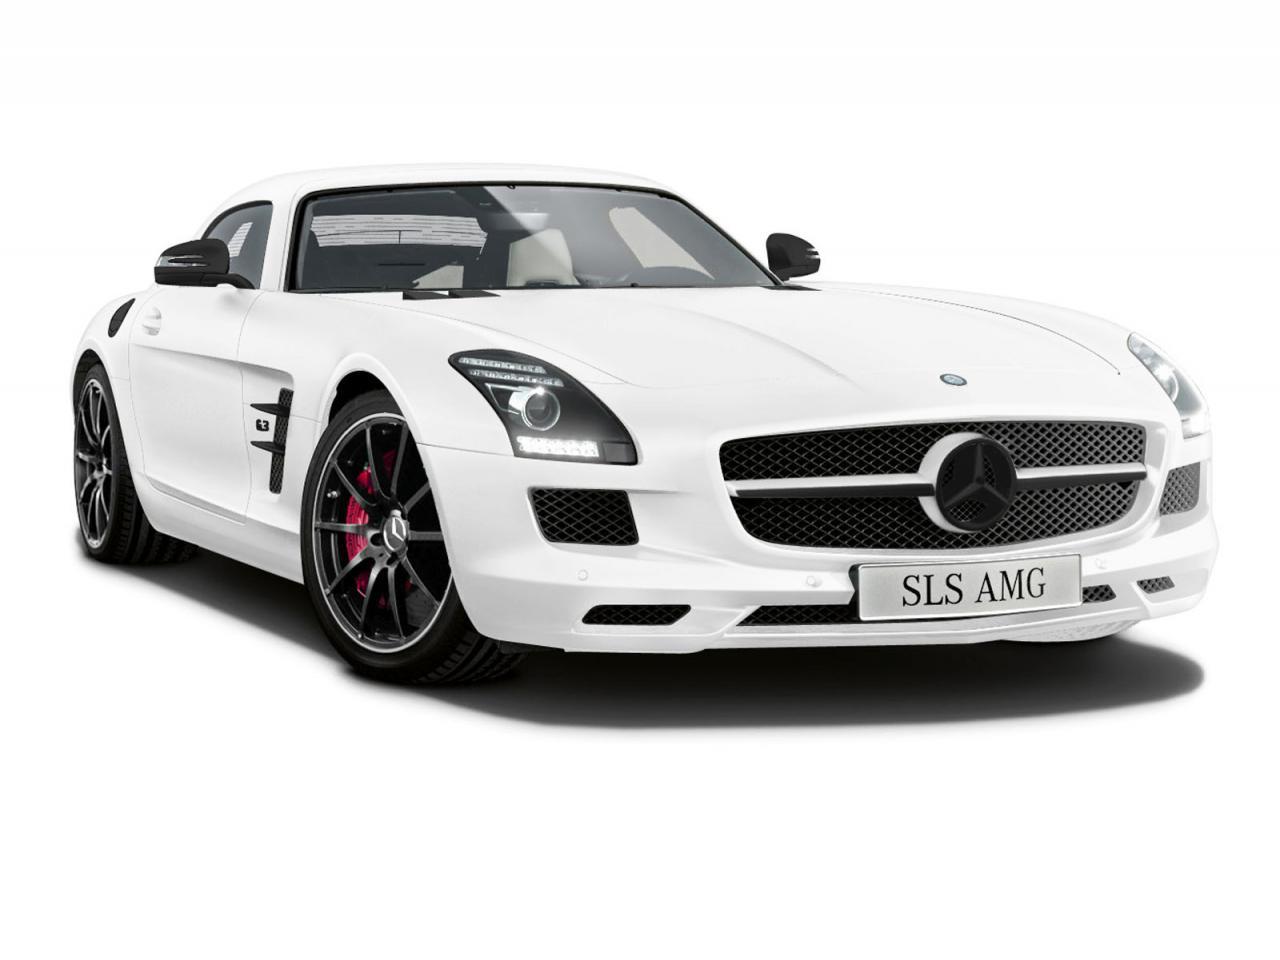 Mercedes SLS AMG Matte Edition